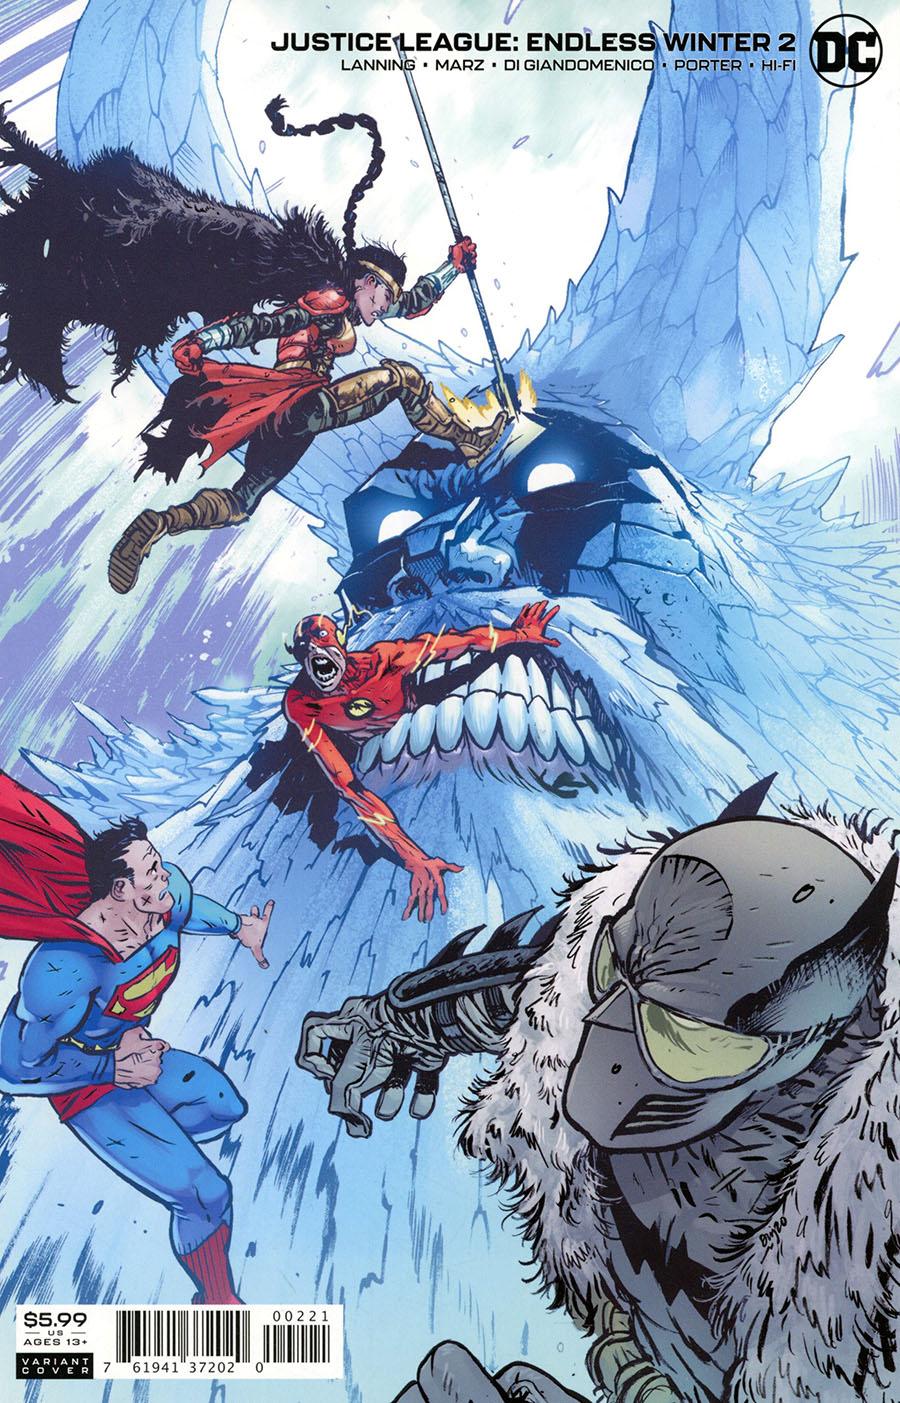 Justice League Endless Winter #2 Cover B Variant Daniel Warren Johnson Card Stock Cover (Endless Winter Part 9)